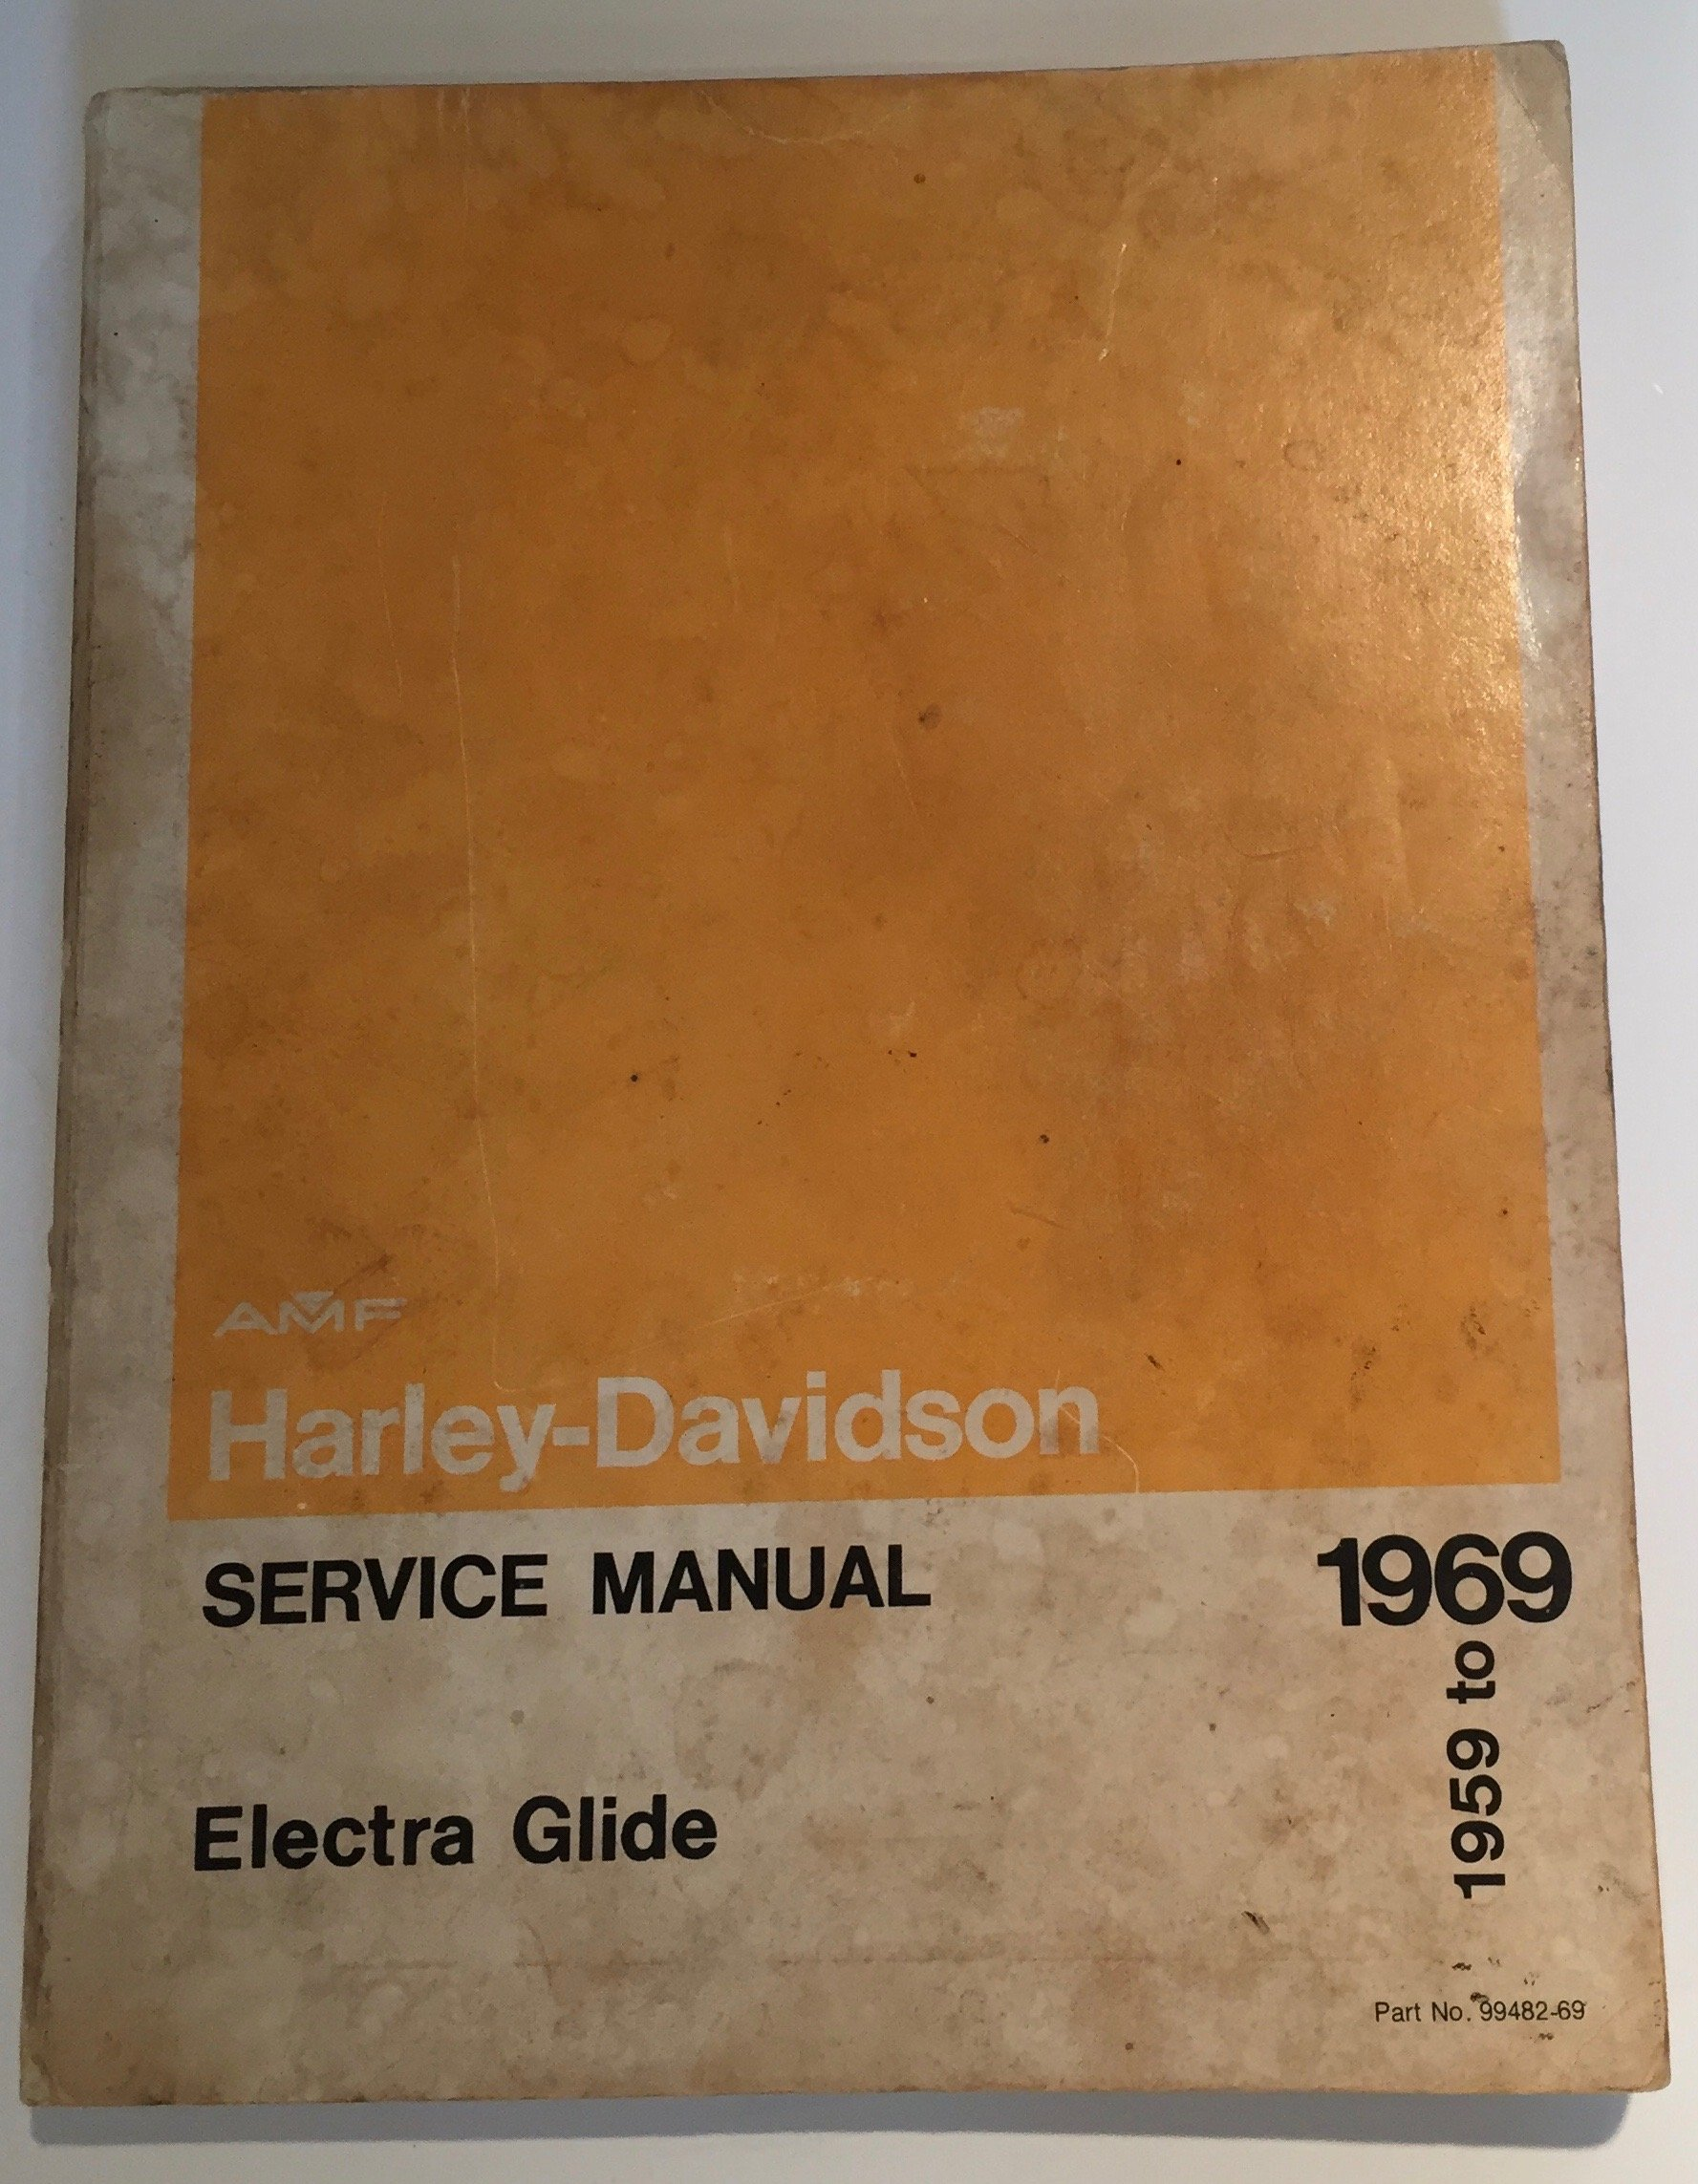 Harley Davidson Service Manual 1959 To 1969 Electra Glide Duo Glide: Harley  Davidson Motor Co.: Amazon.com: Books